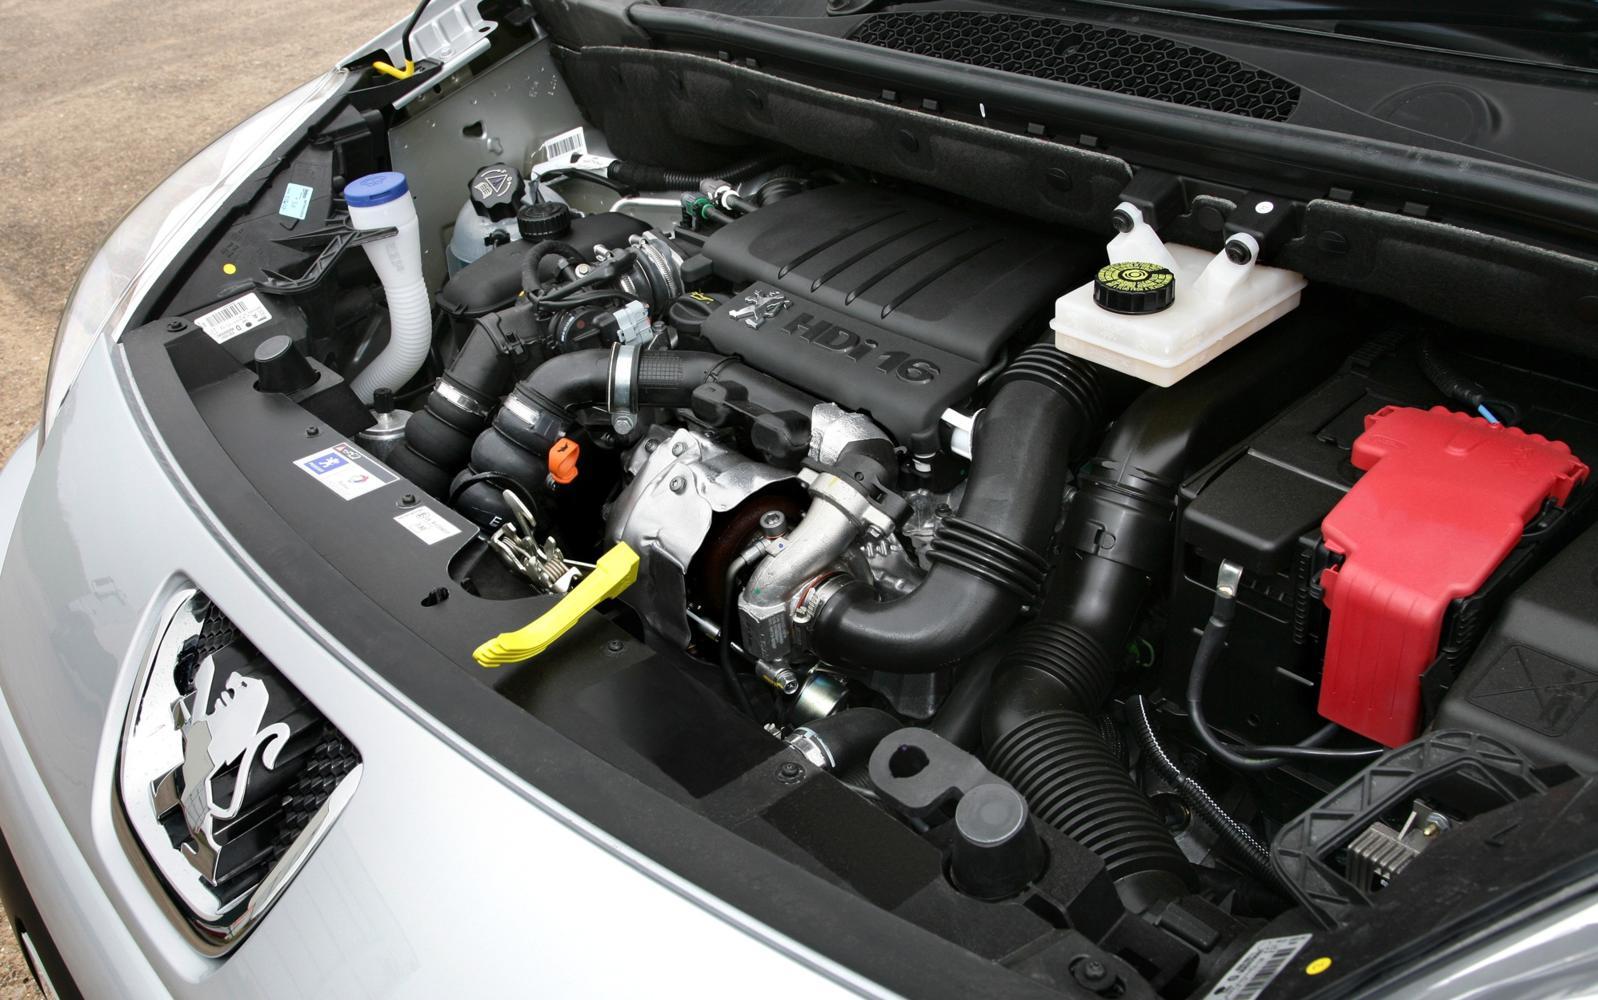 Peugeot Partner Tepee 2013 Engine Bay: Peugeot Bipper Engine Diagram At Satuska.co